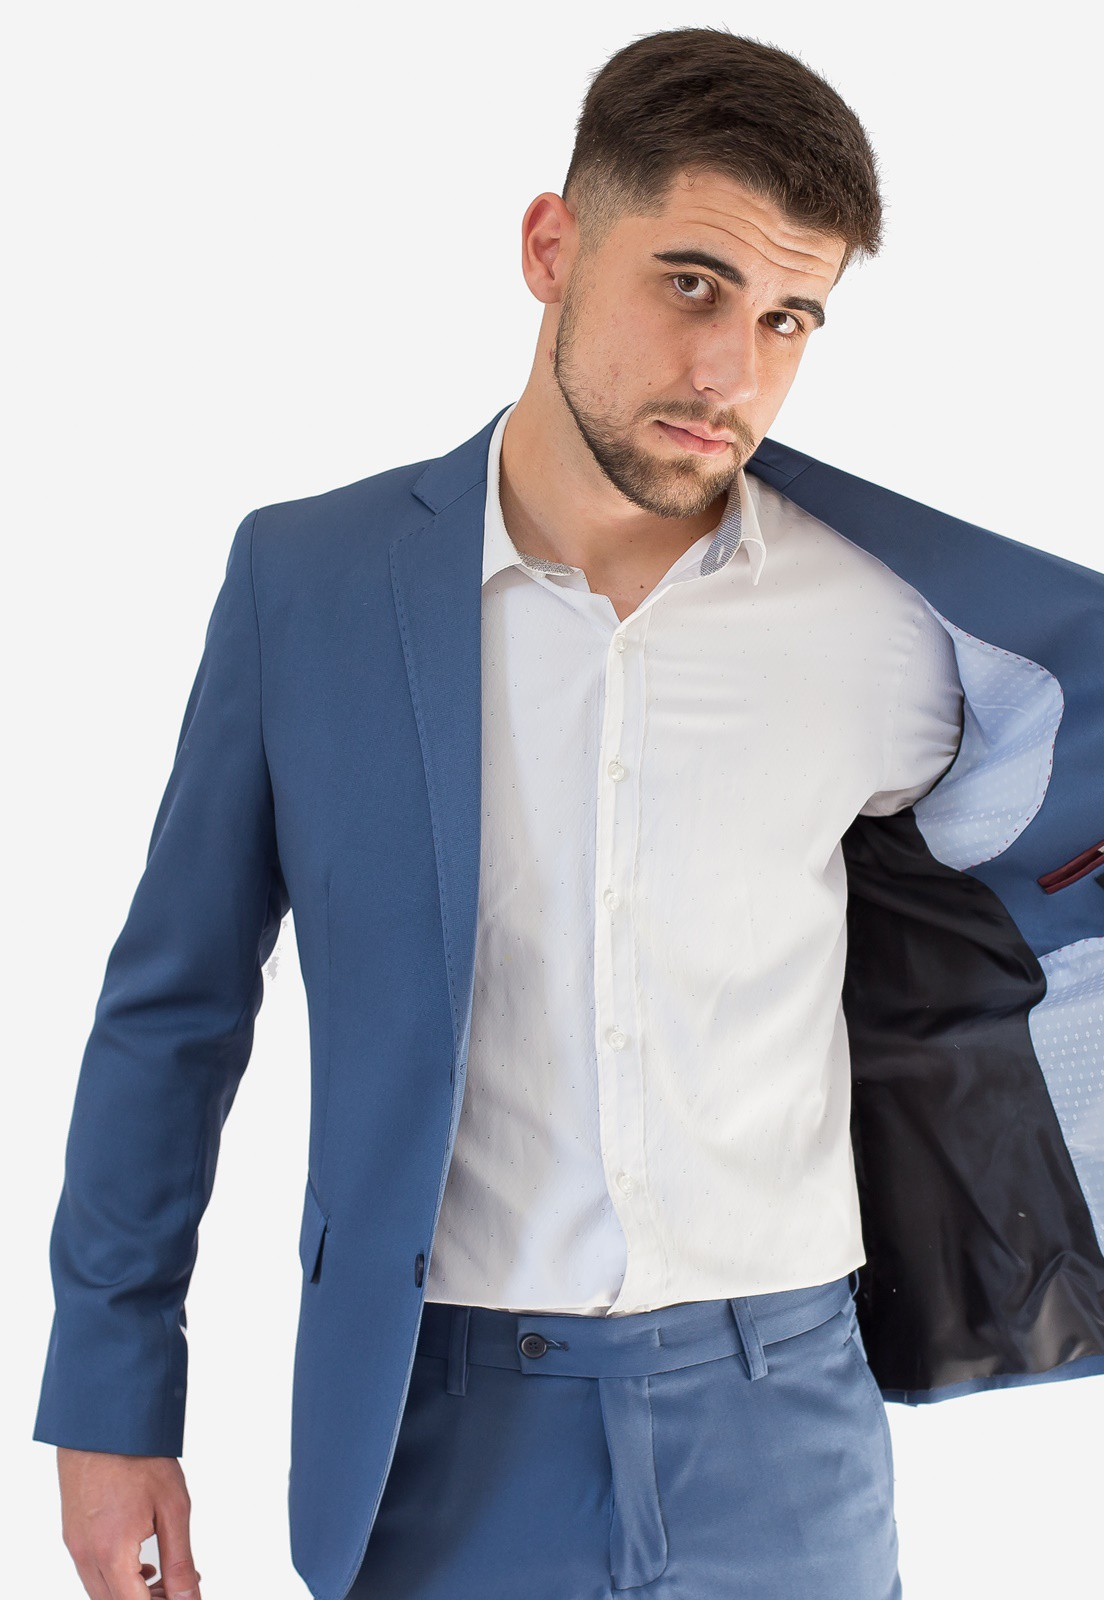 Terno Masculino Slim Fit Microfibra Azul Claro Jordhan